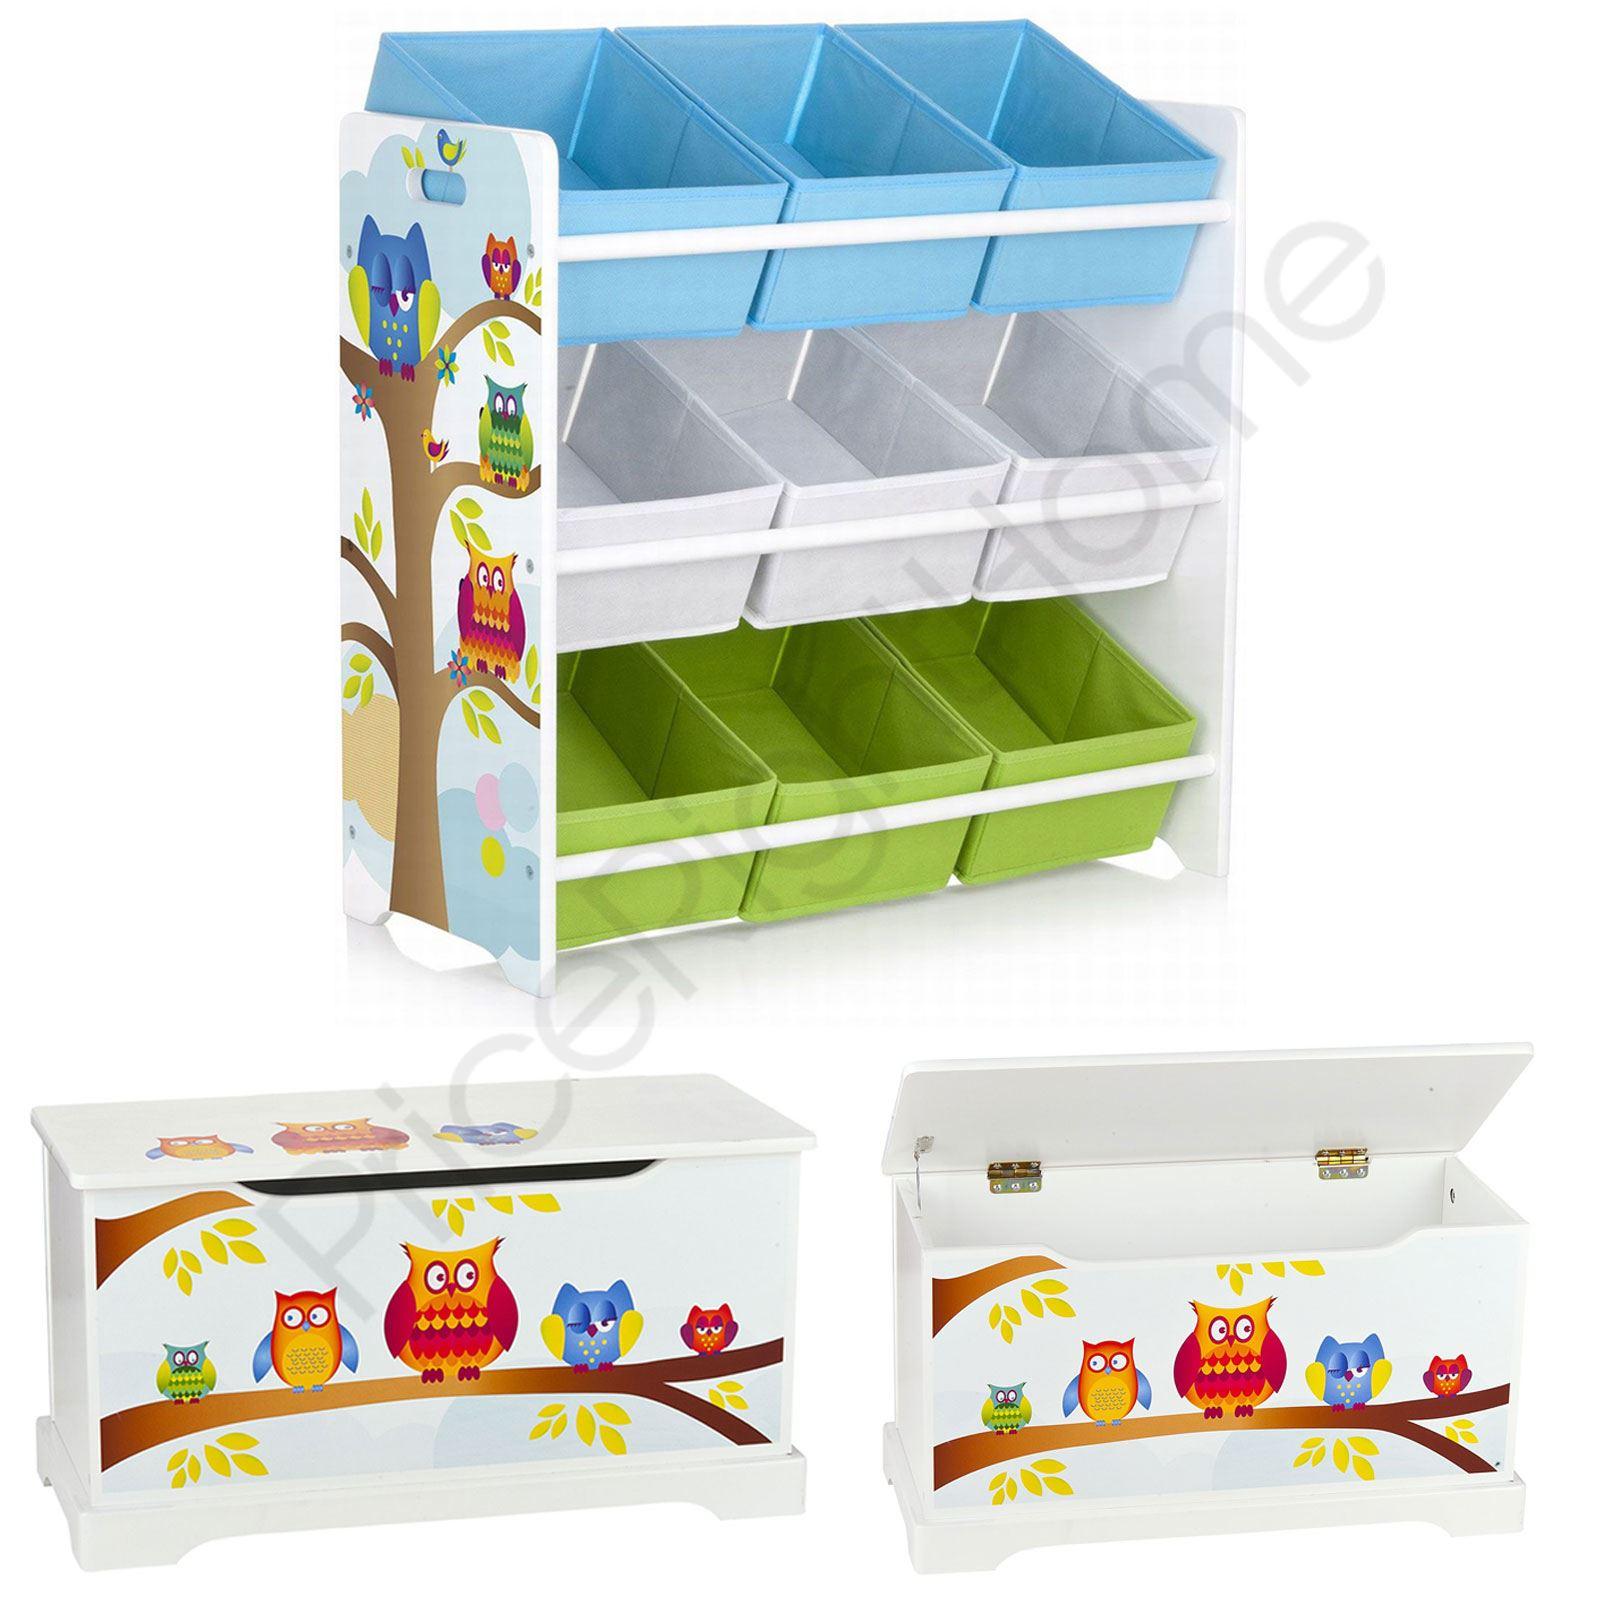 Wood Effect Kids Playroom Bedroom Storage Chest Trunk: WOODEN TOY BOX, 9 BIN STORAGE UNIT DRAWERS